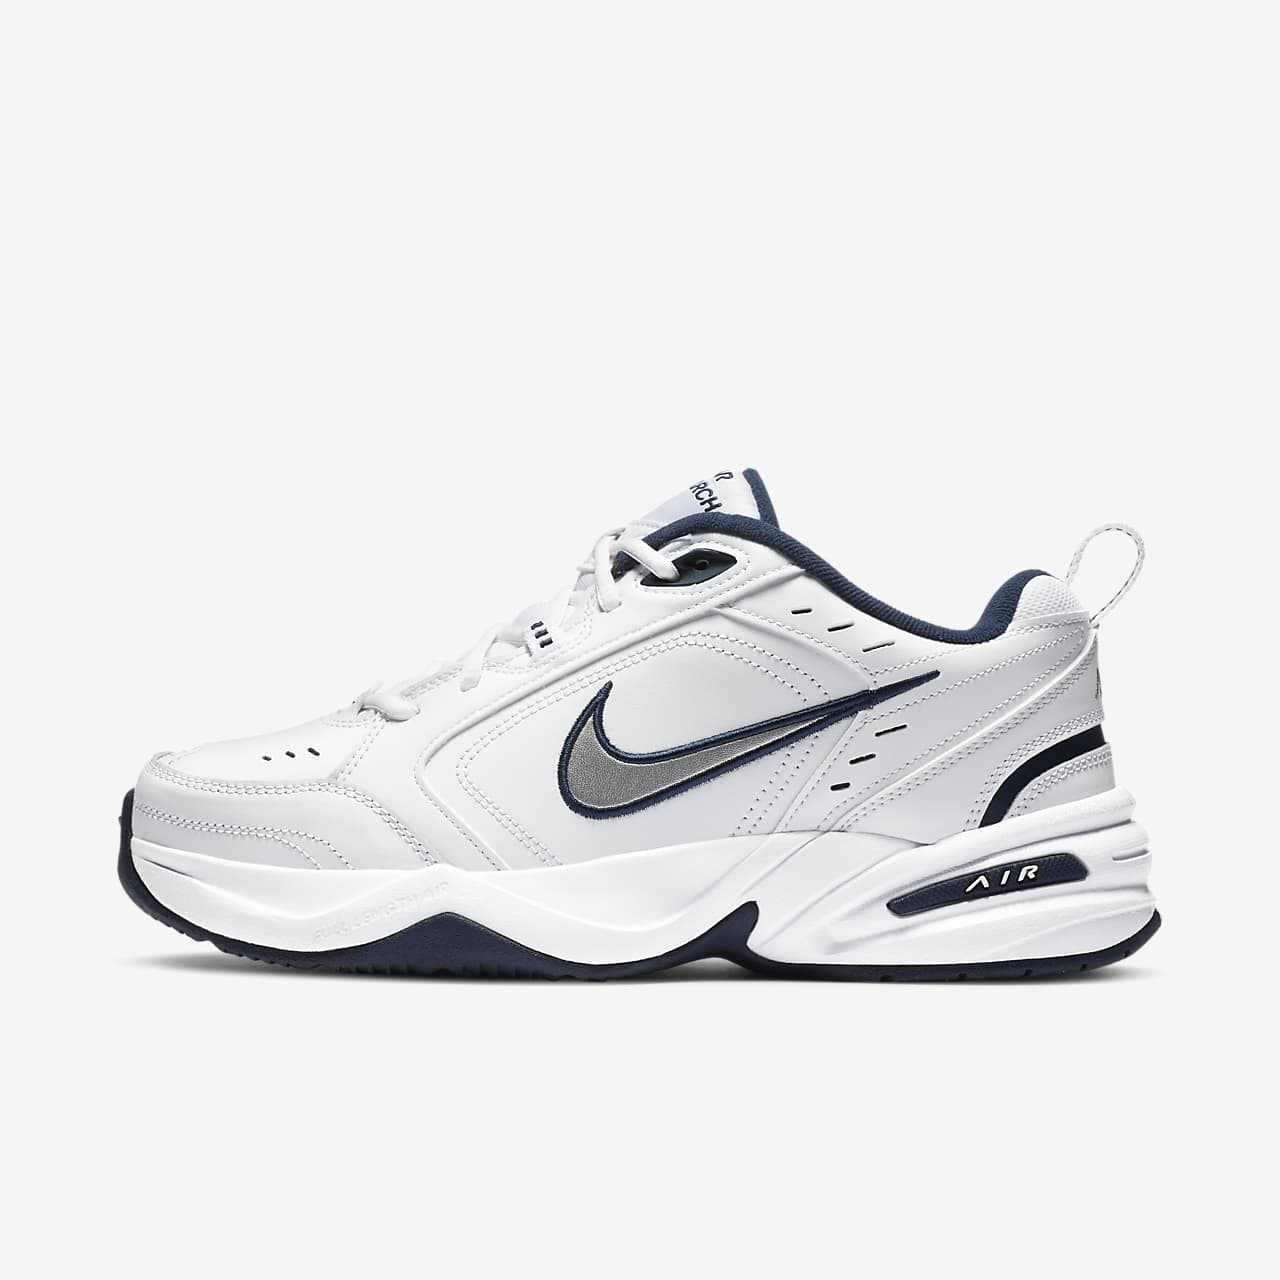 new styles 44e38 05cce ... Кроссовки для занятий в зале на каждый день Nike Air Monarch IV